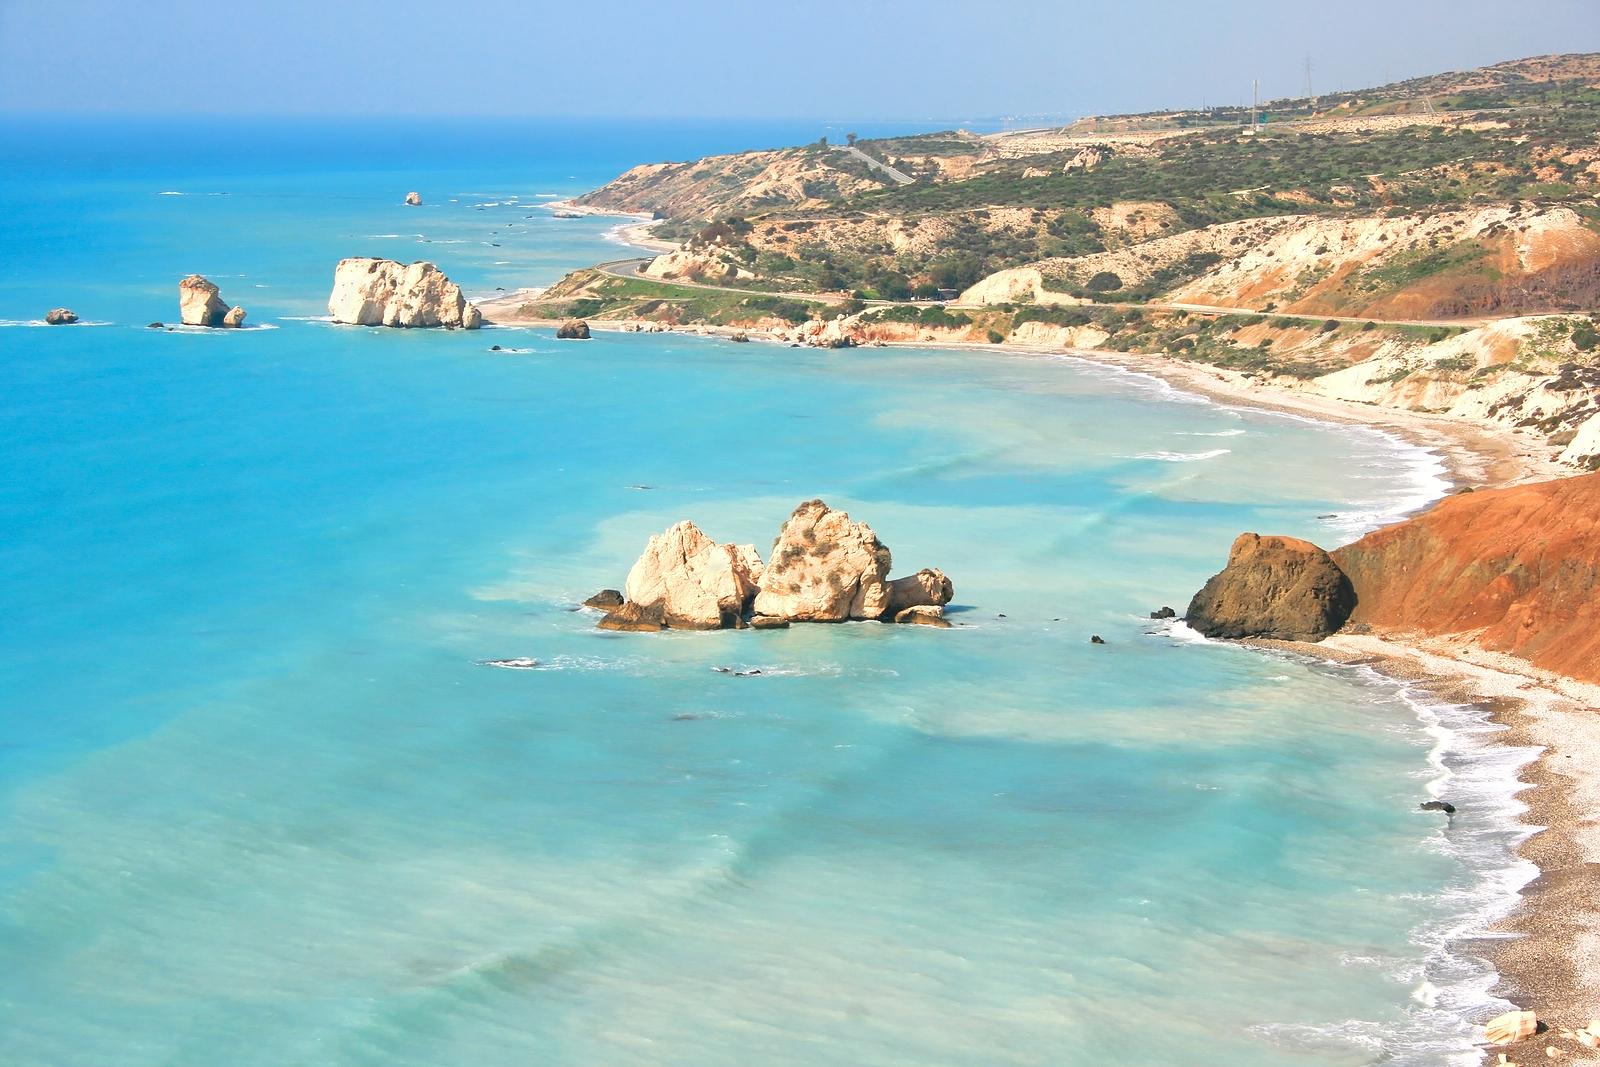 beaches-paphos-cyprus